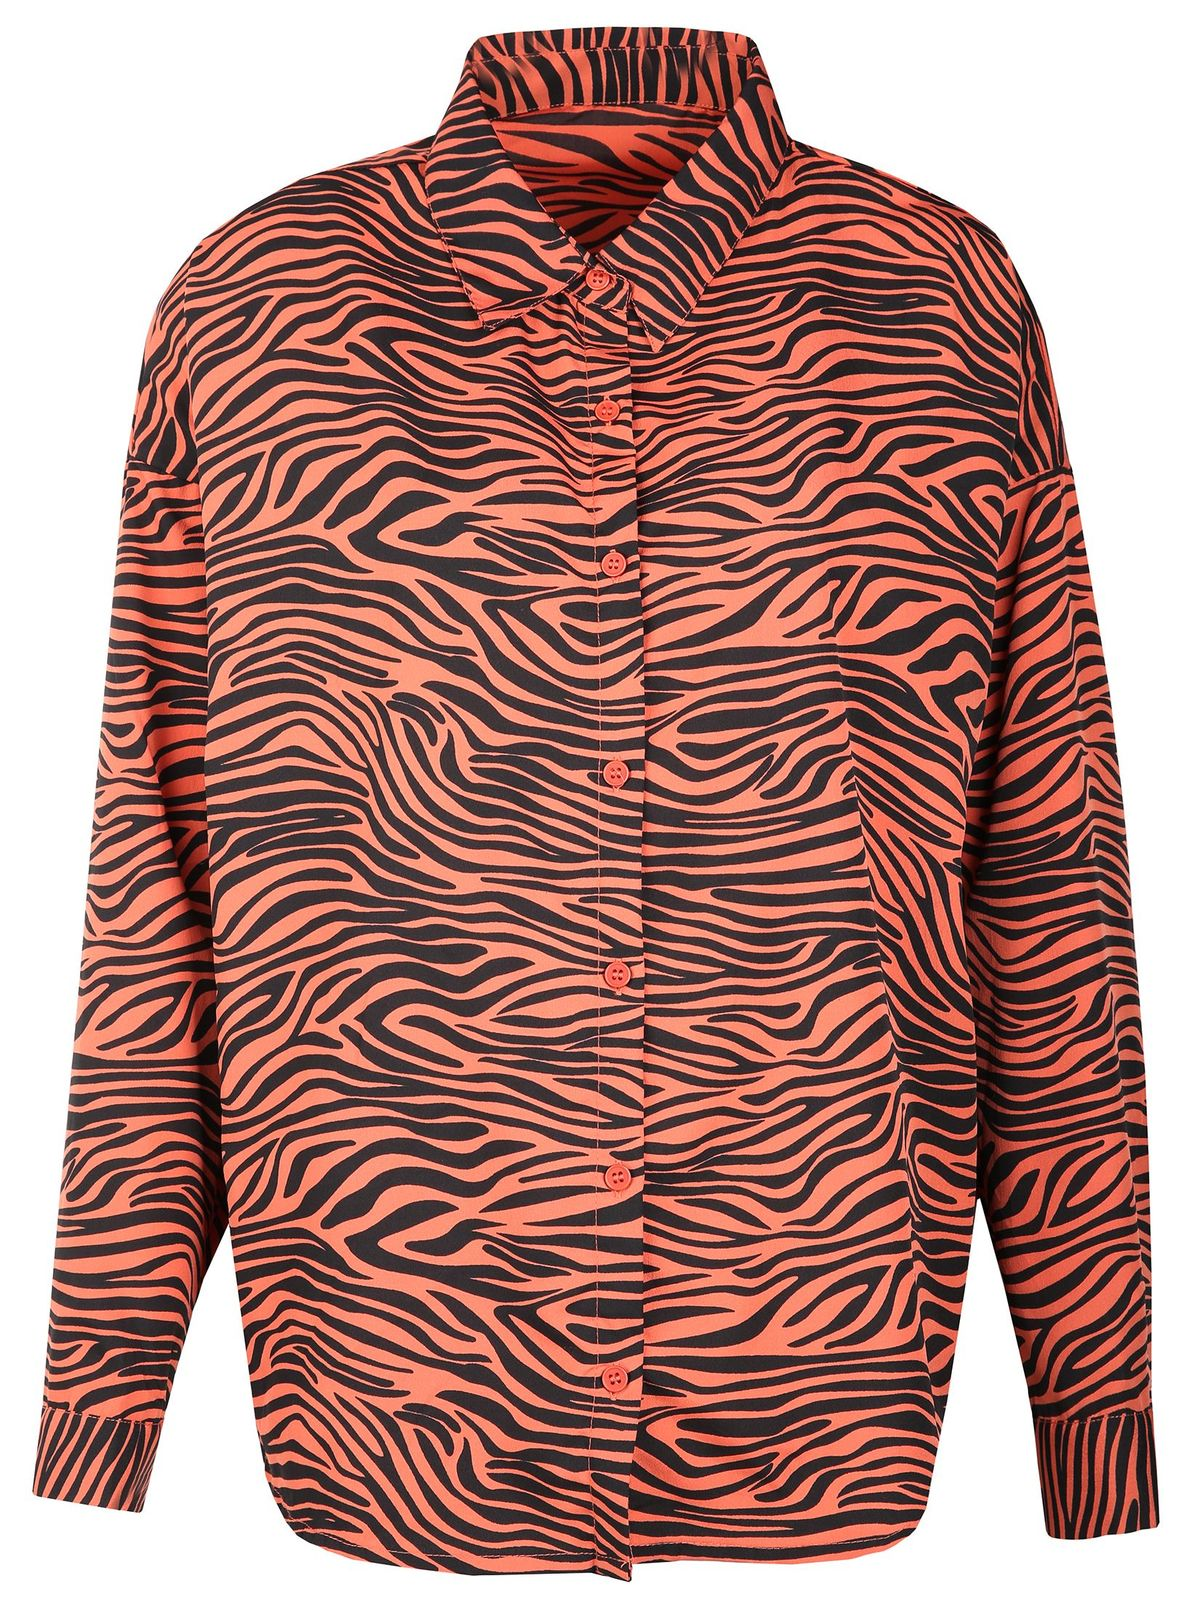 TOP SECRET κοκκινο πουκαμισο animal print